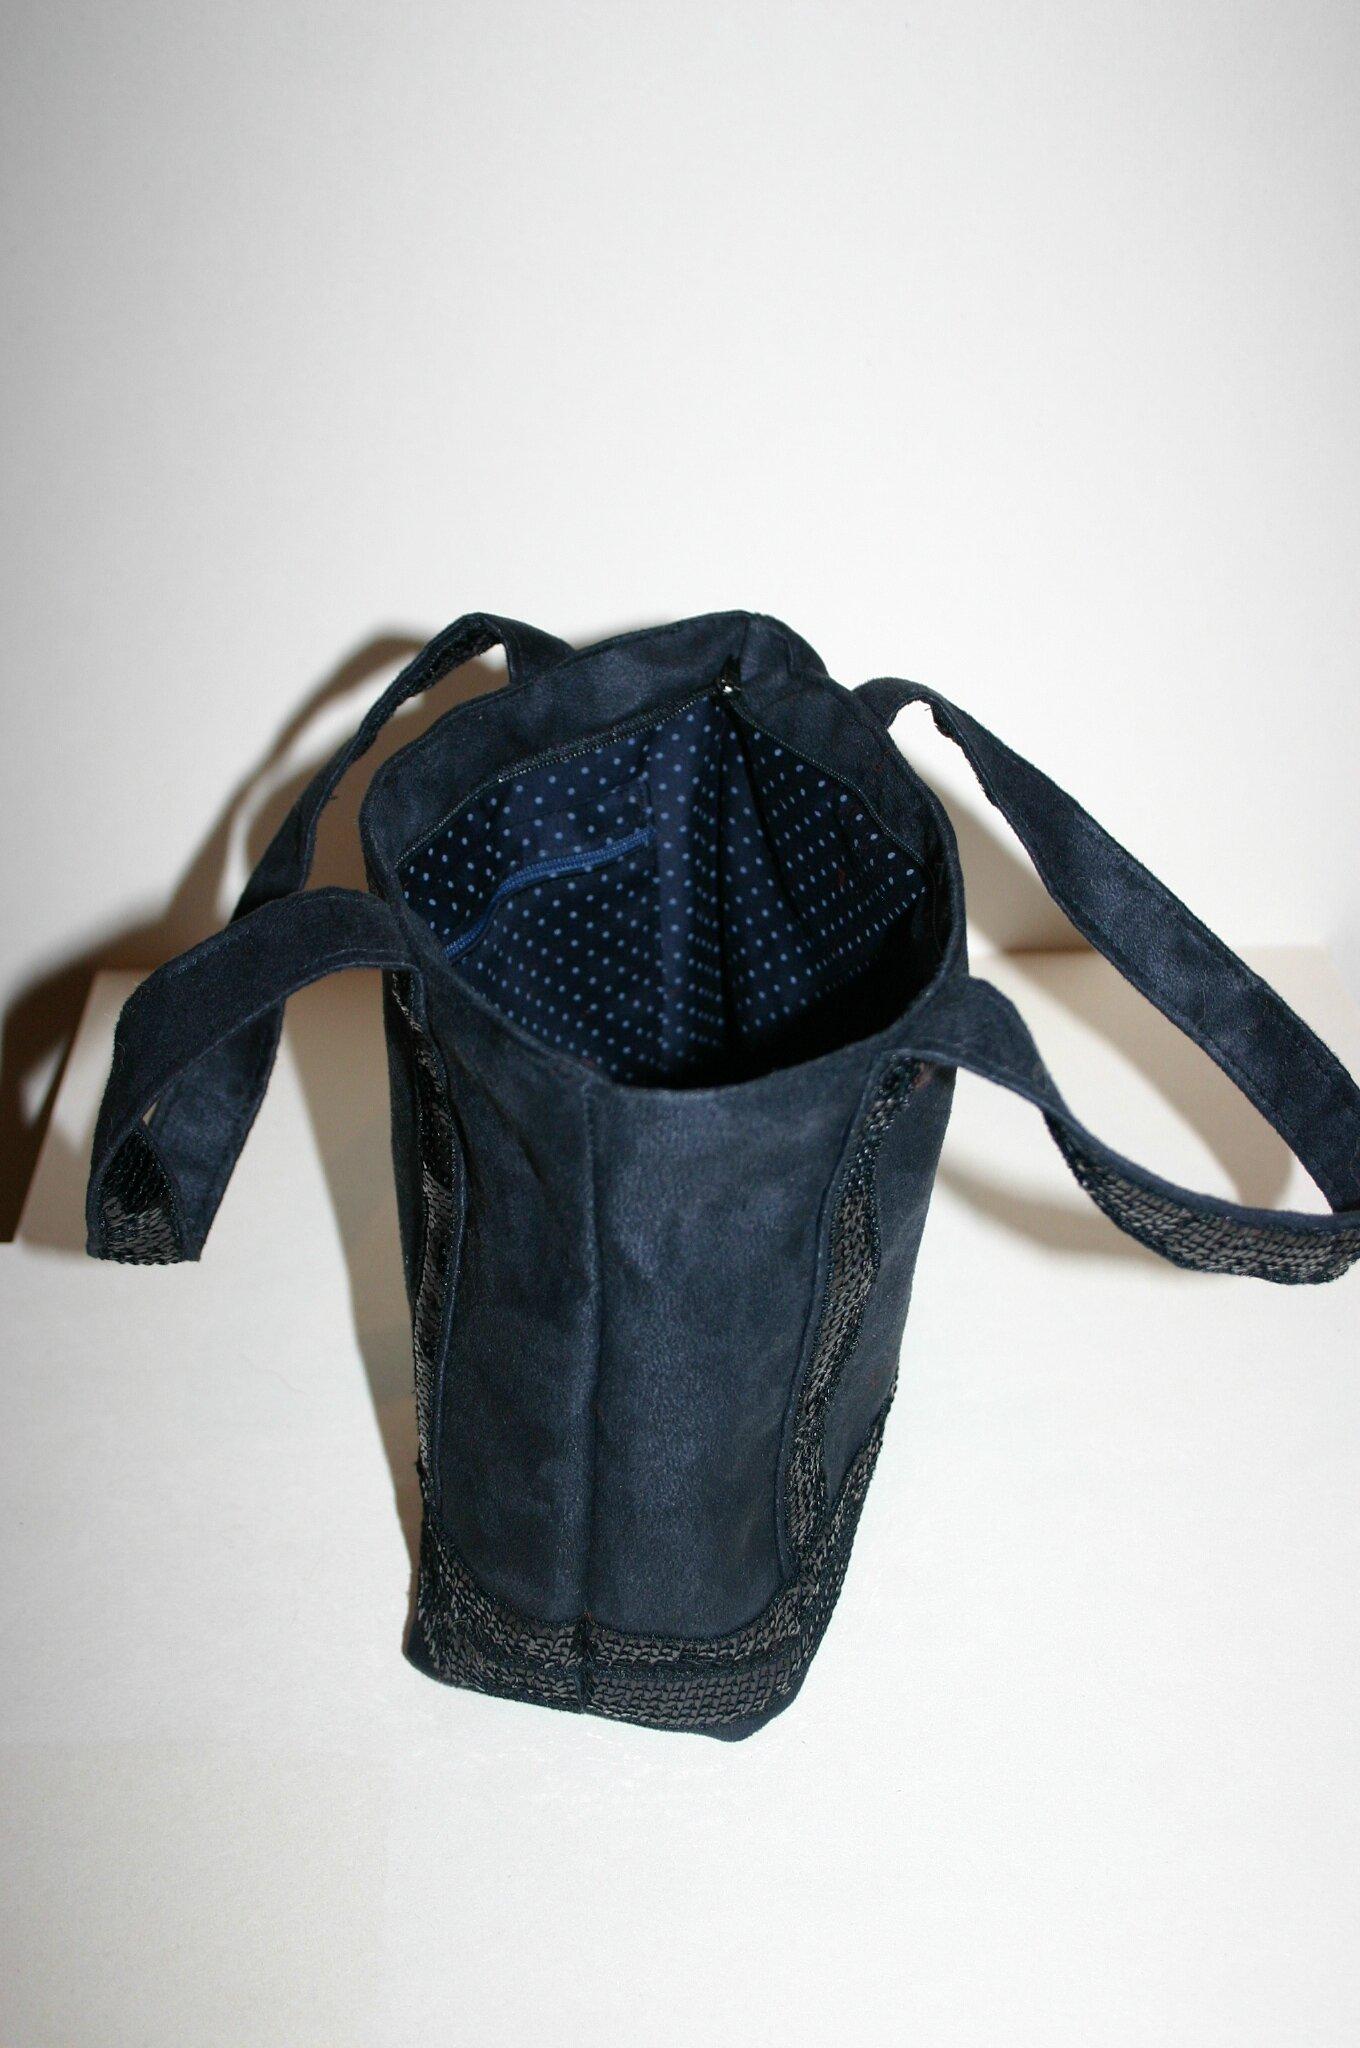 Favori sac à paillettes :tuto bis - naniecousette DK45